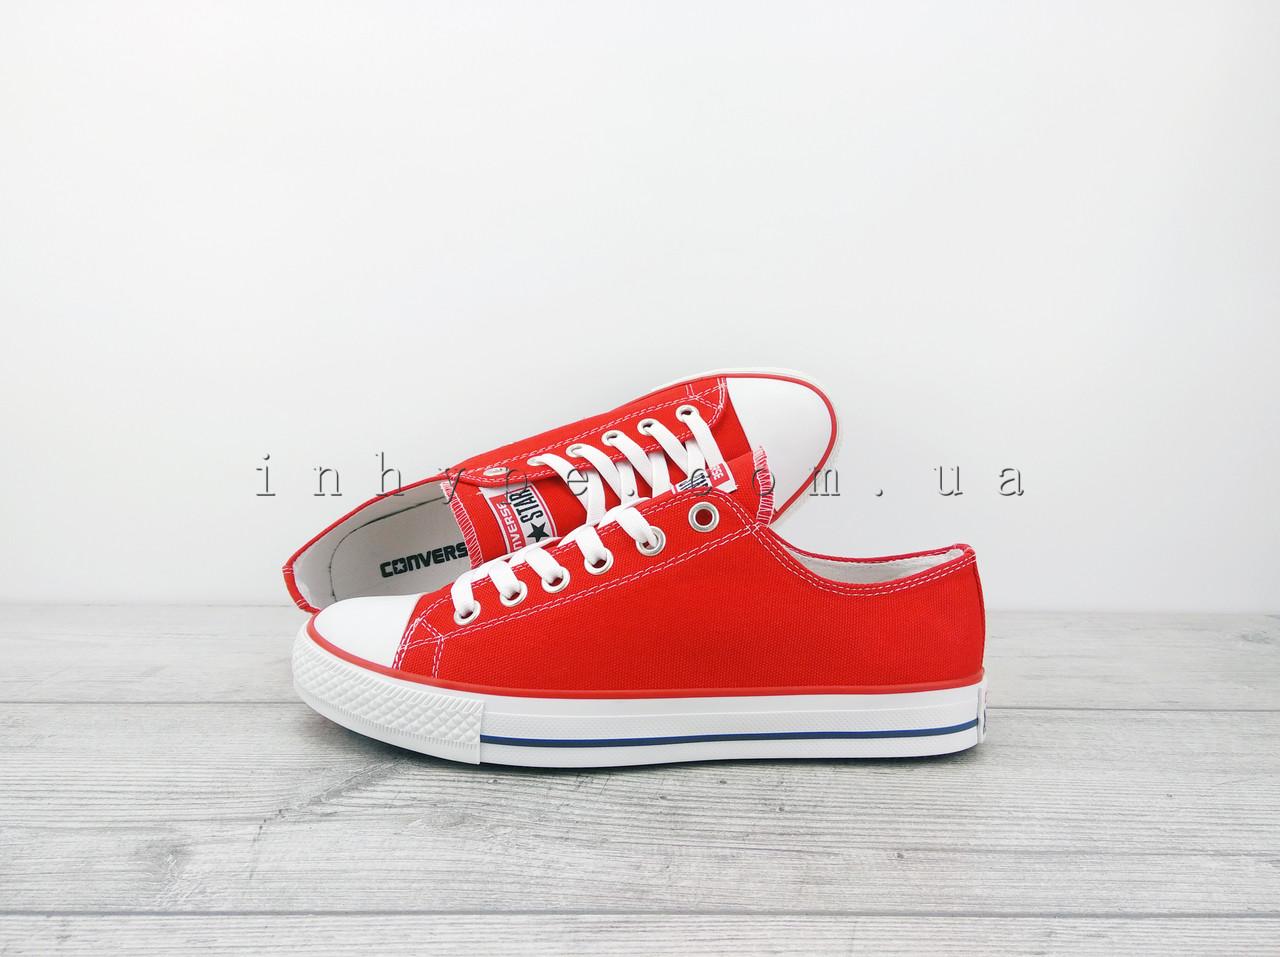 Мужские кеды Converse all Star chuck taylor конверс ол стар красные